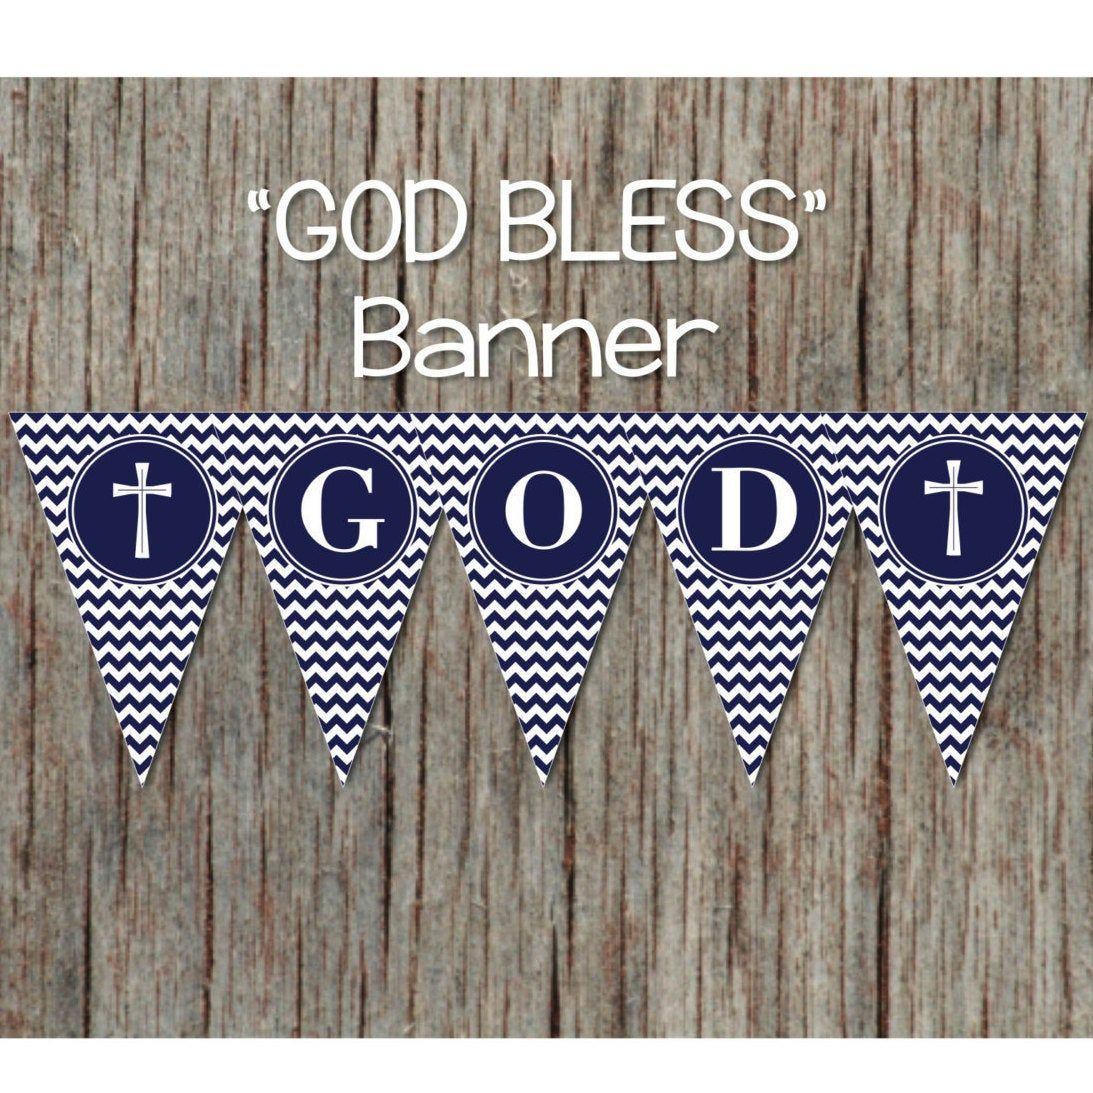 30+ Free printable god bless banner ideas